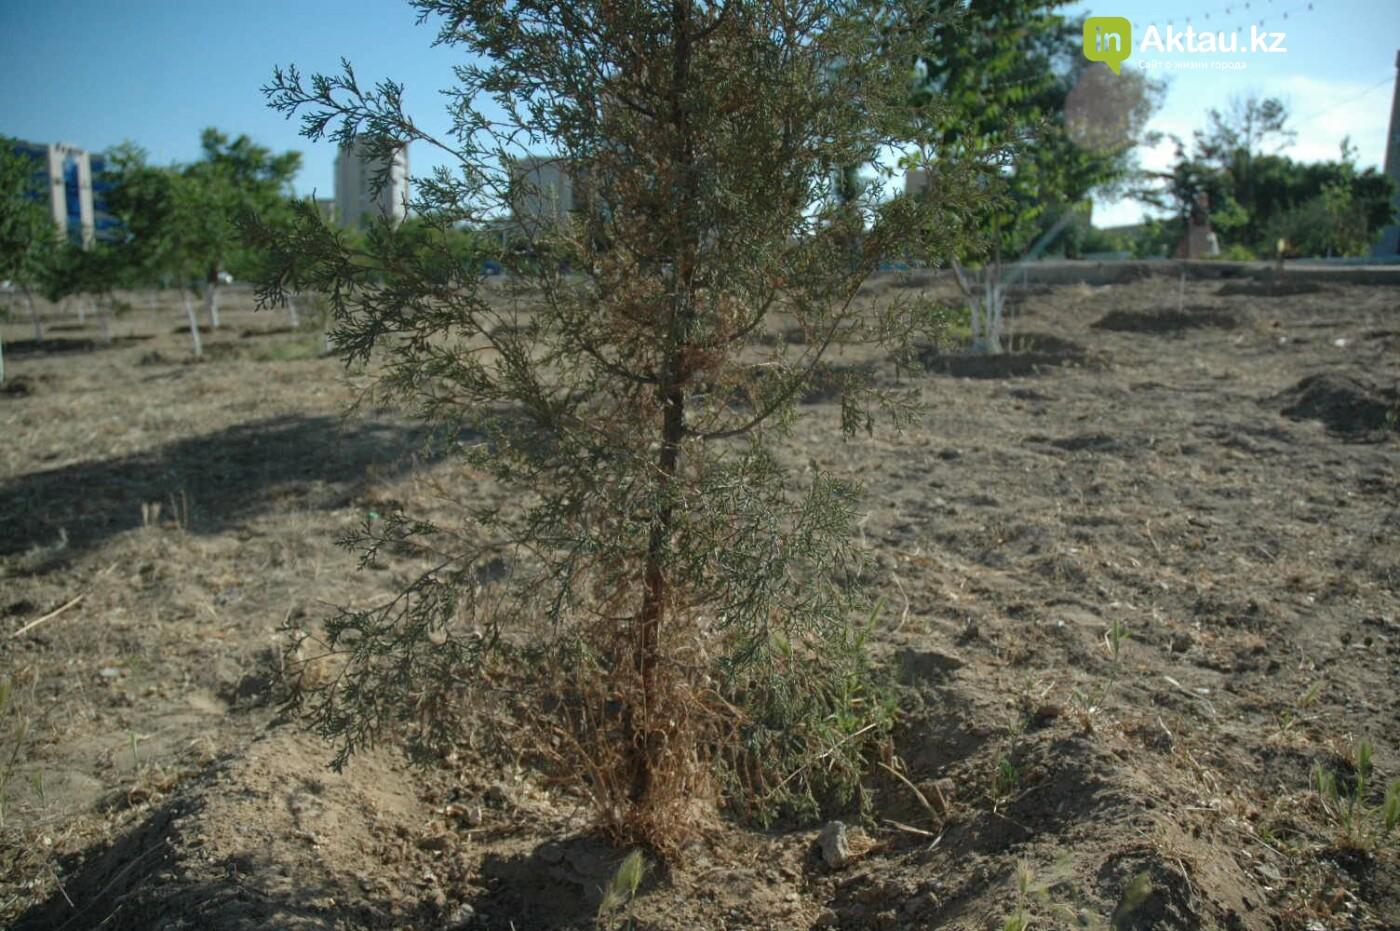 Погибшие от засухи и обезвоживания в Актау исчисляются десятками (ФОТО), фото-10